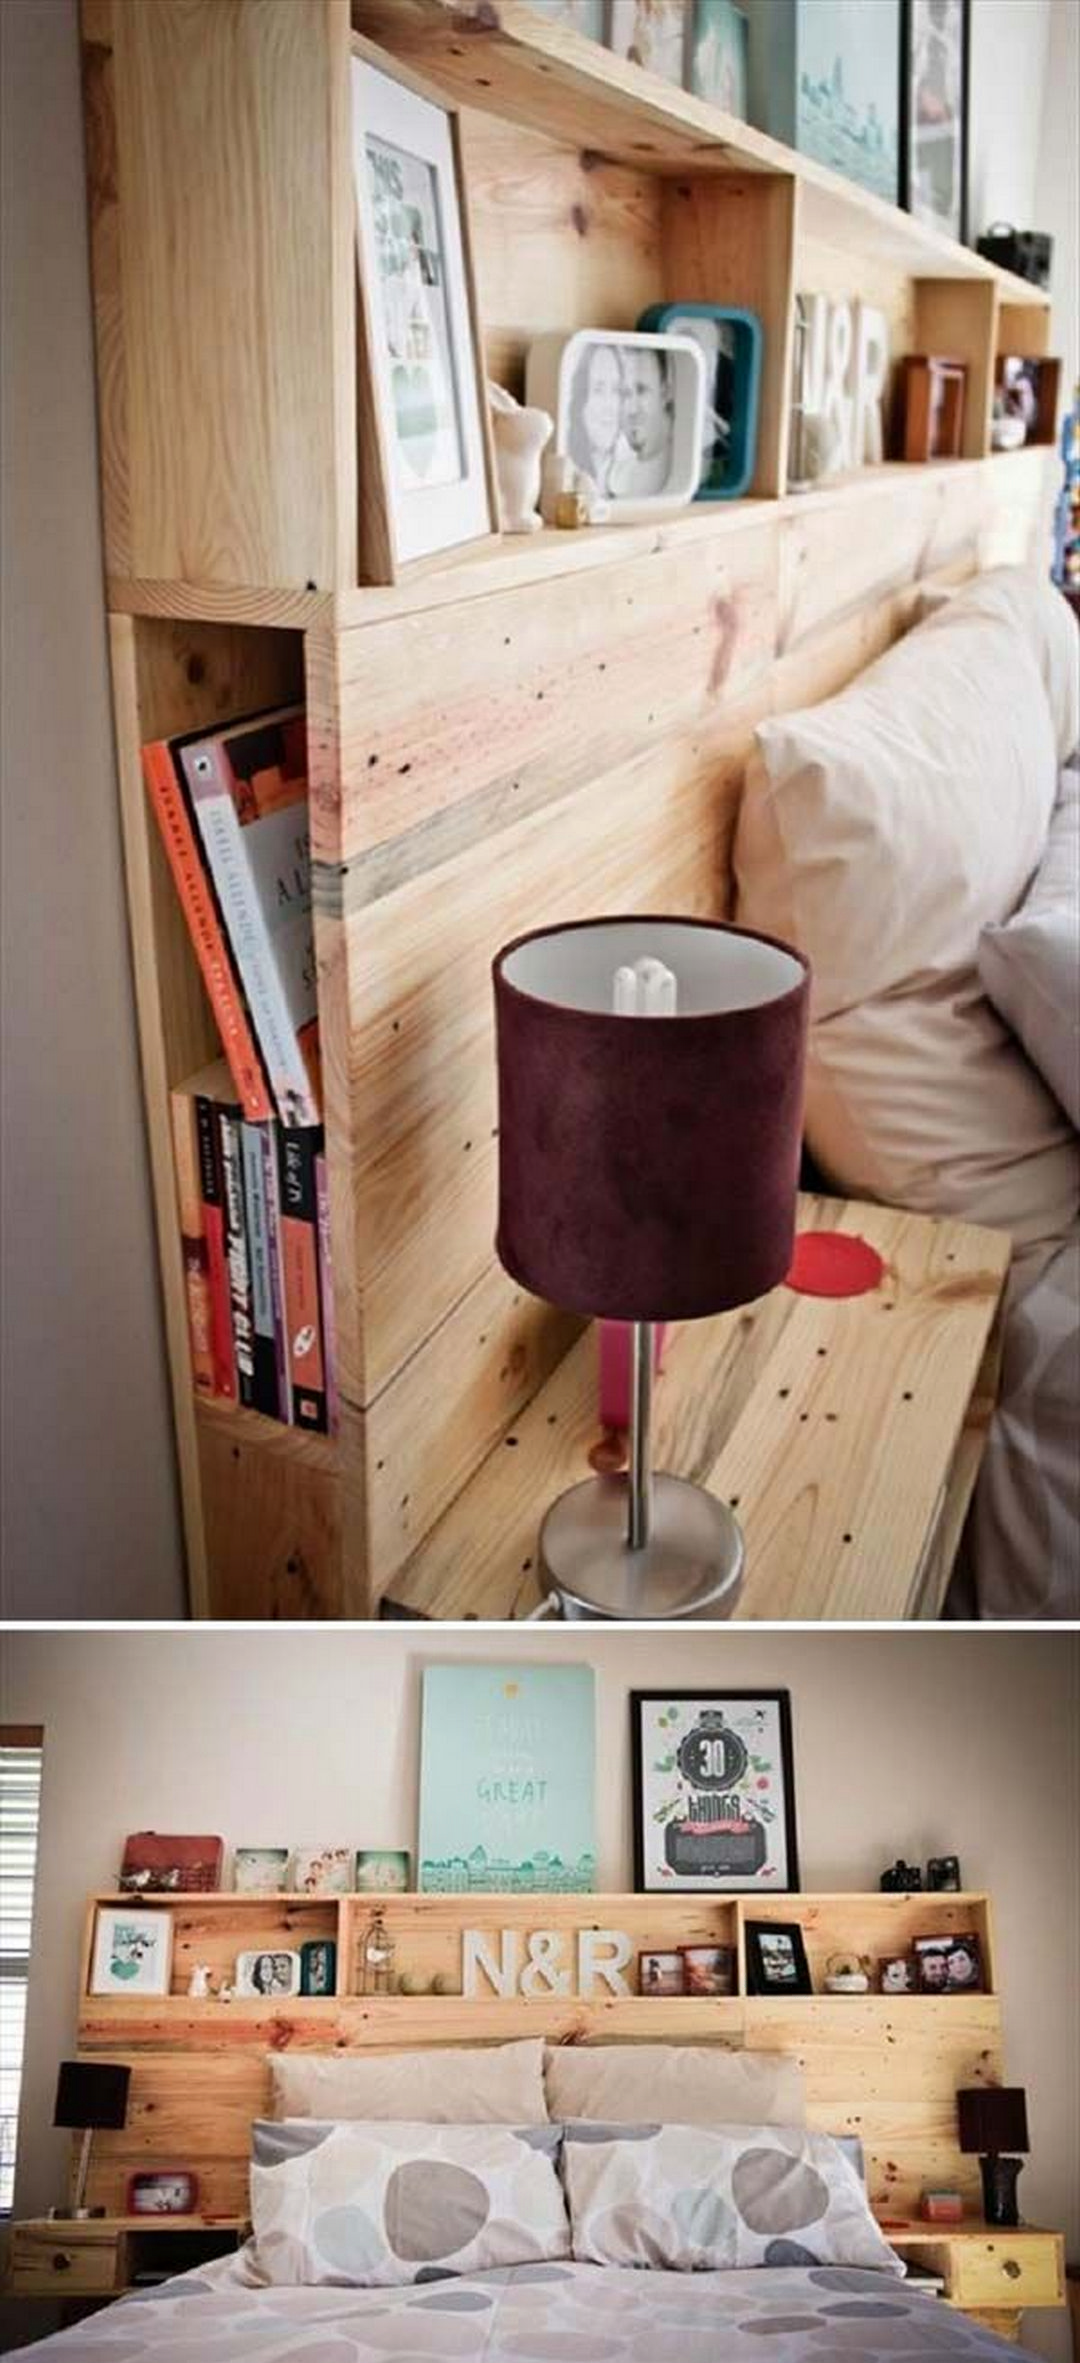 53 Brilliant Bedroom Storage Design Ideas   Pinterest